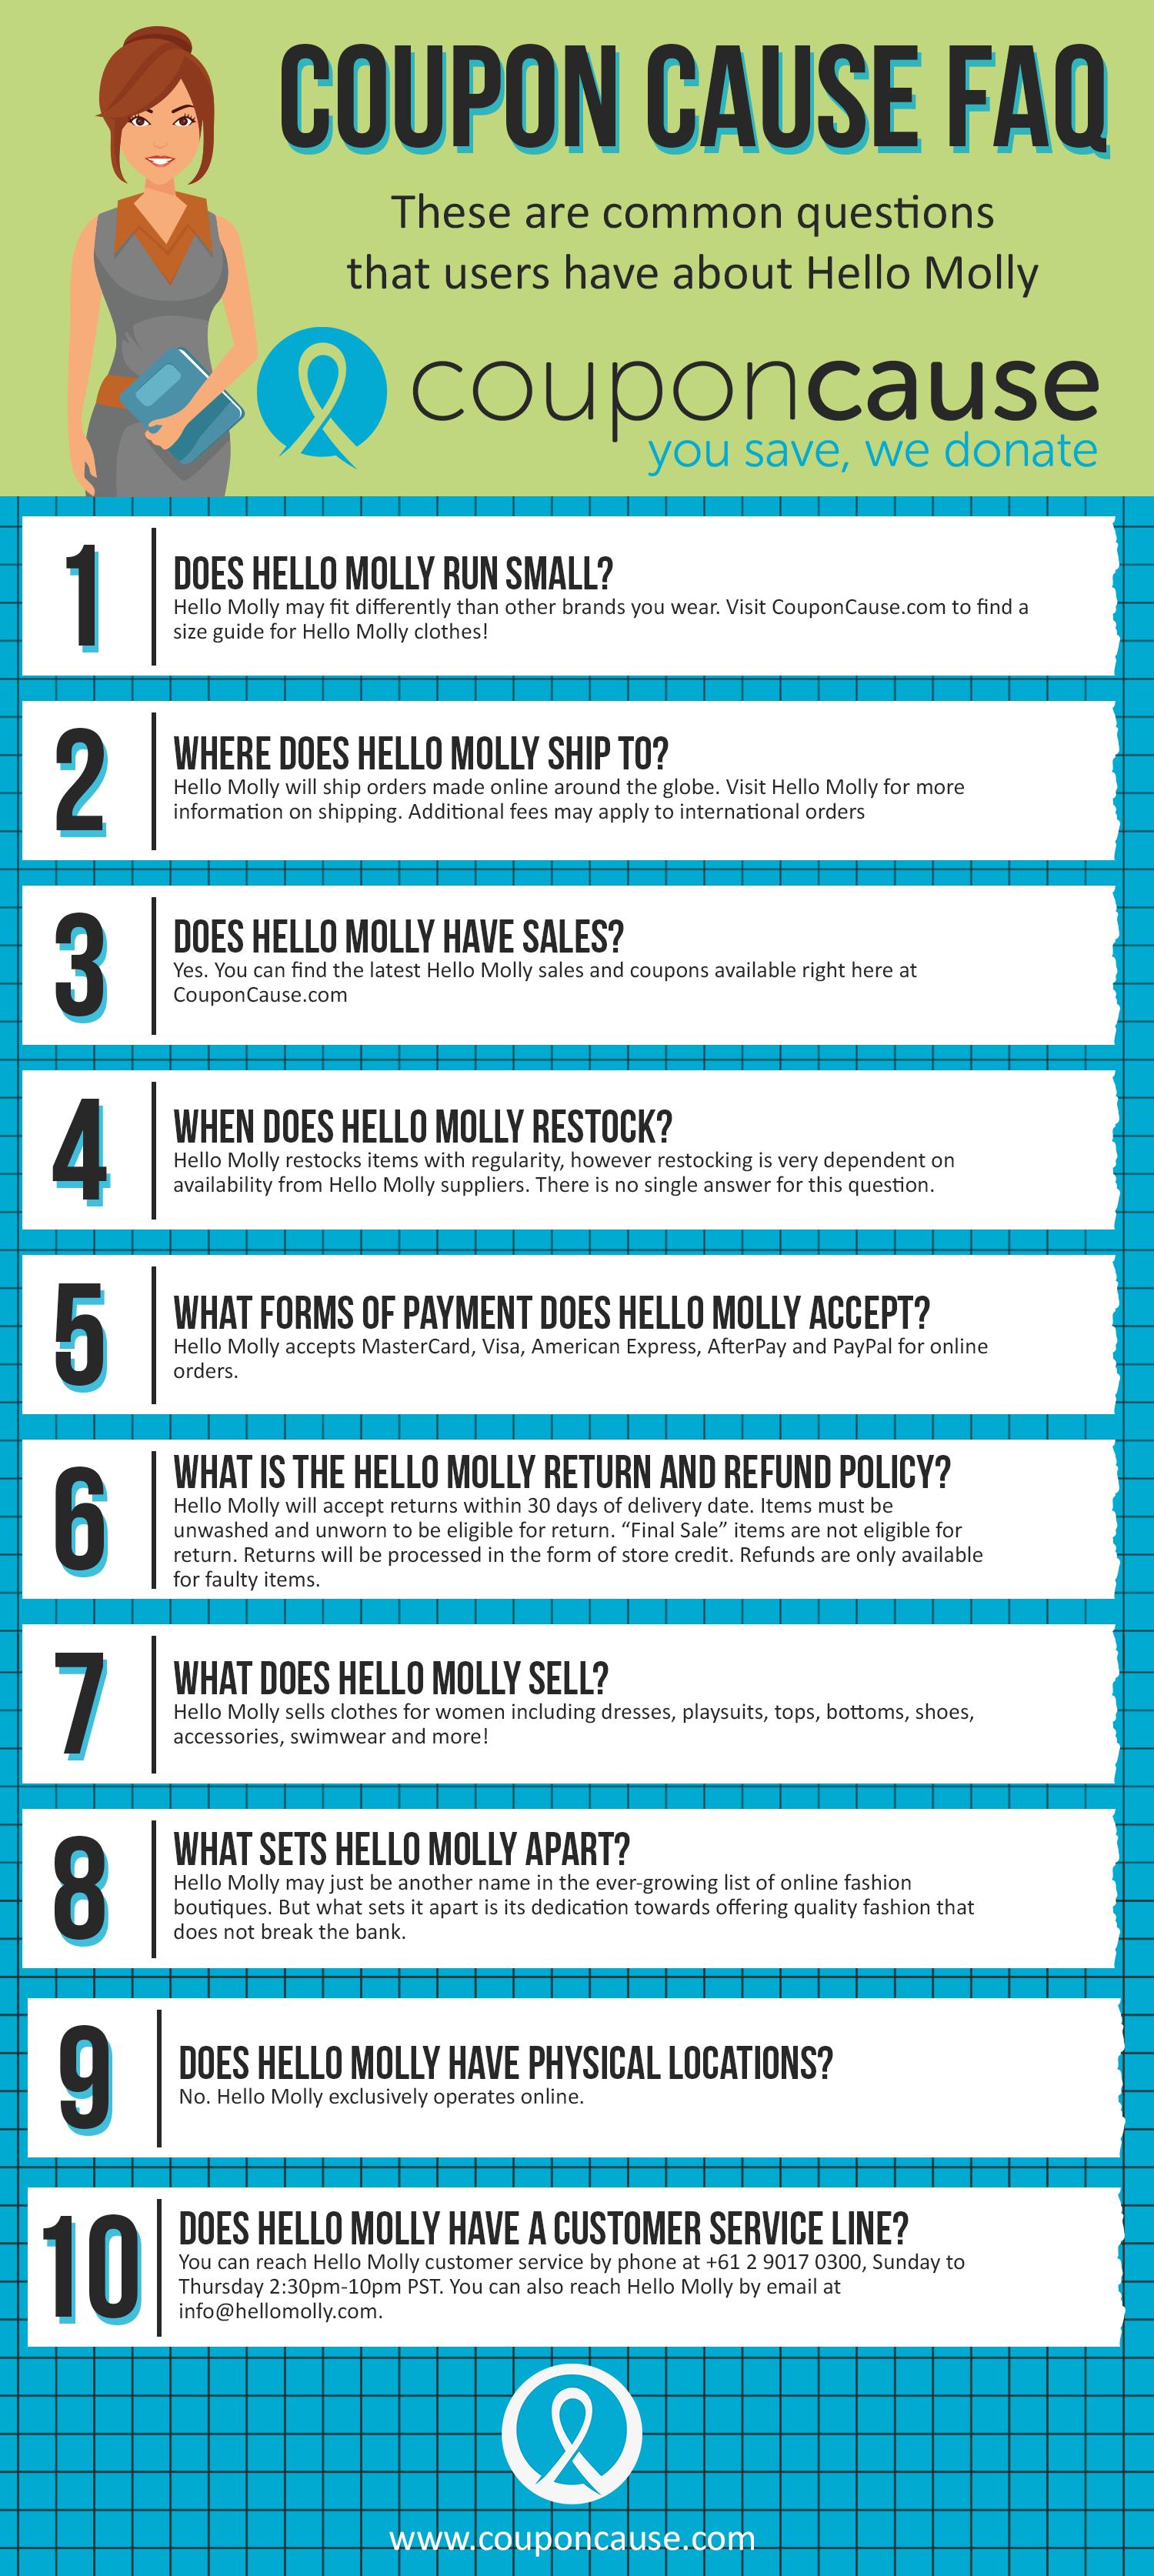 Hello Molly Coupon Cause FAQ (C.C. FAQ)